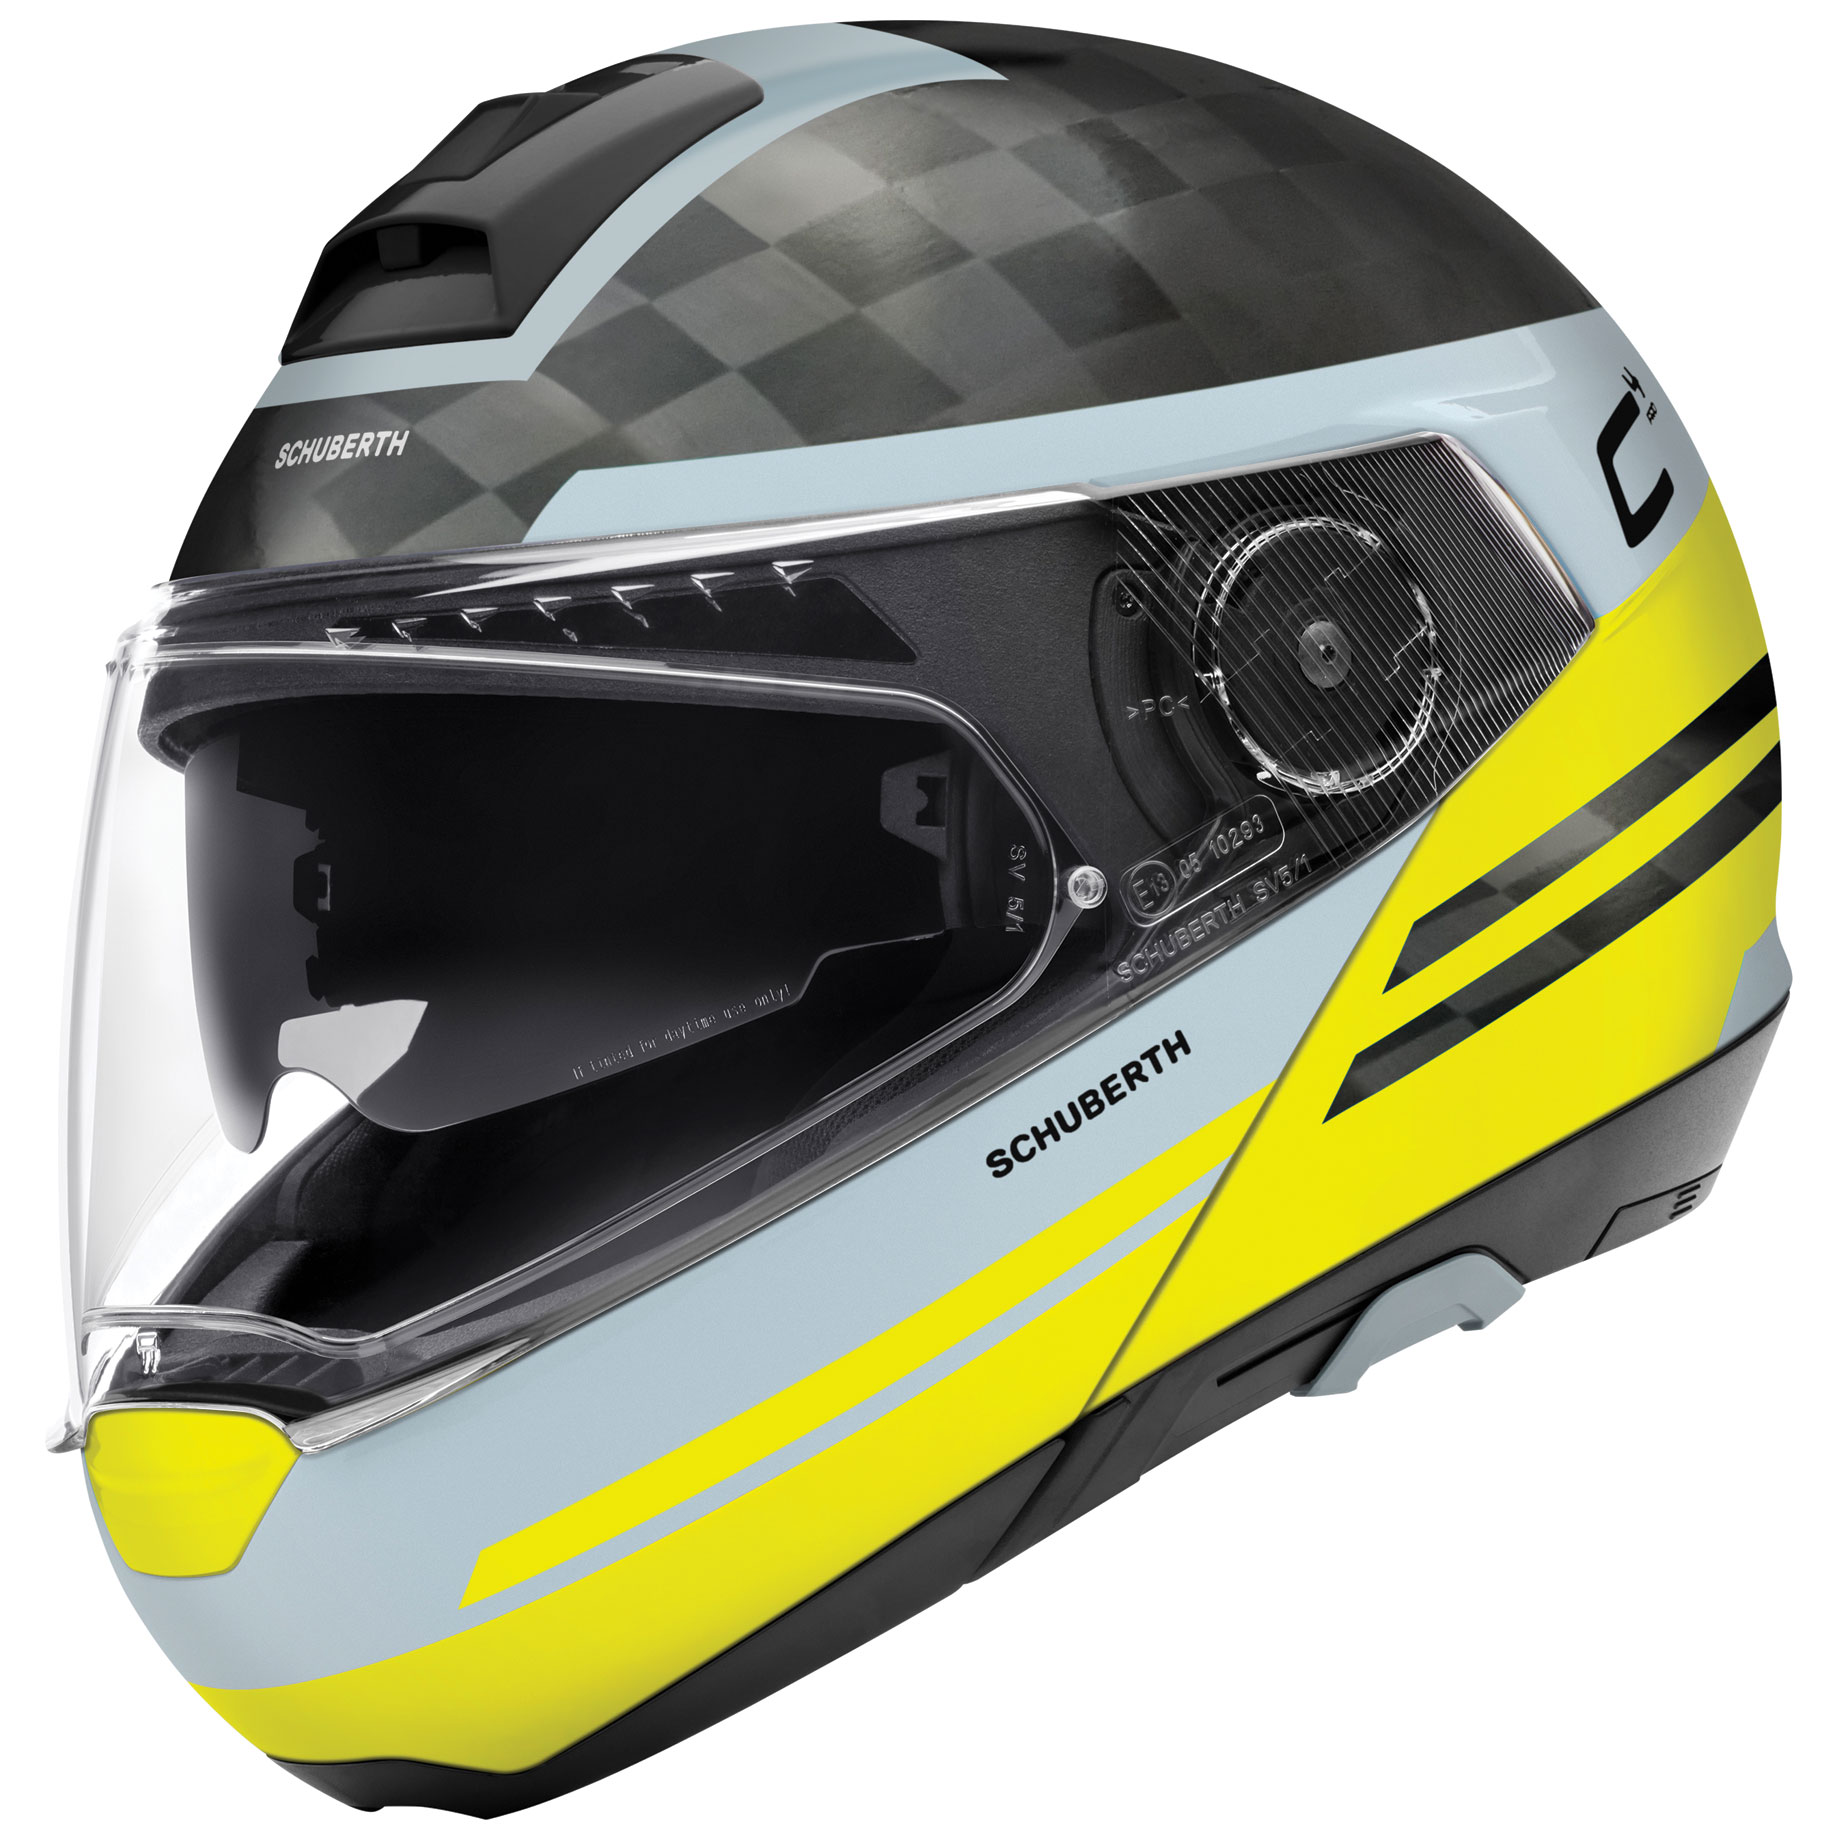 Schuberth C4 Pro Carbon Tempest Yellow Modular Helmet